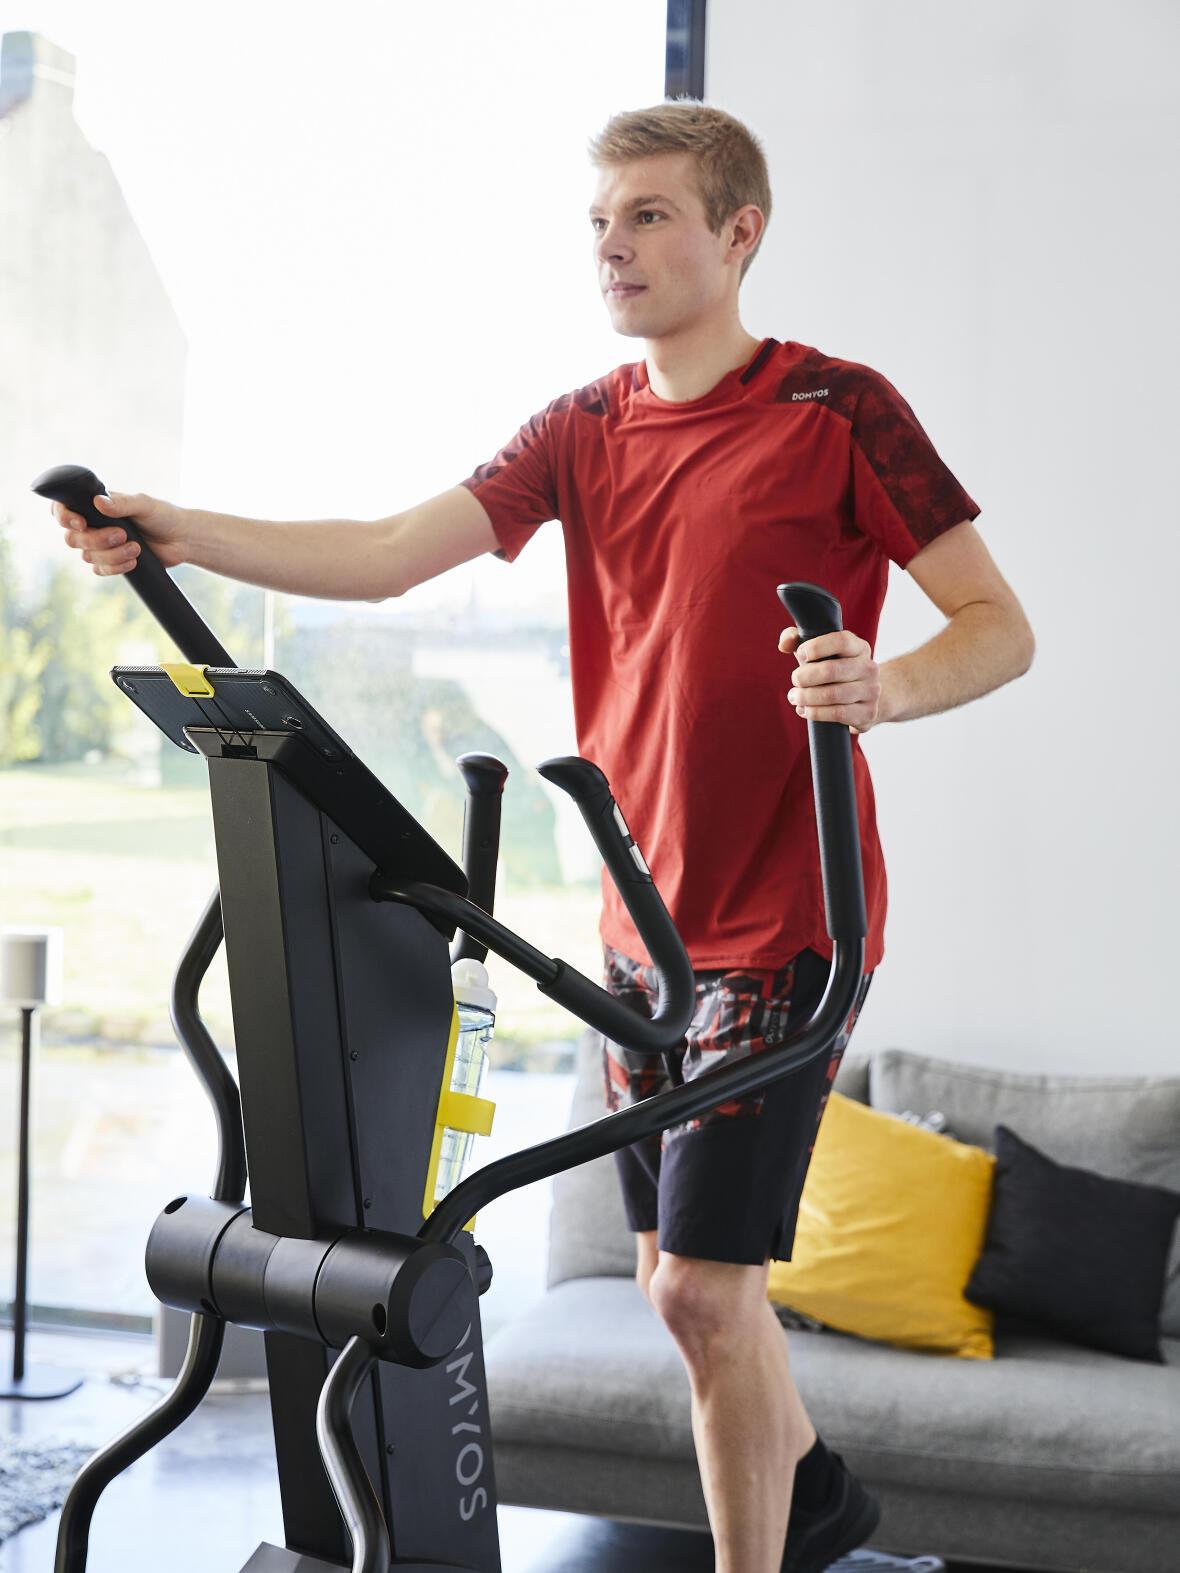 Cross trainer interval training